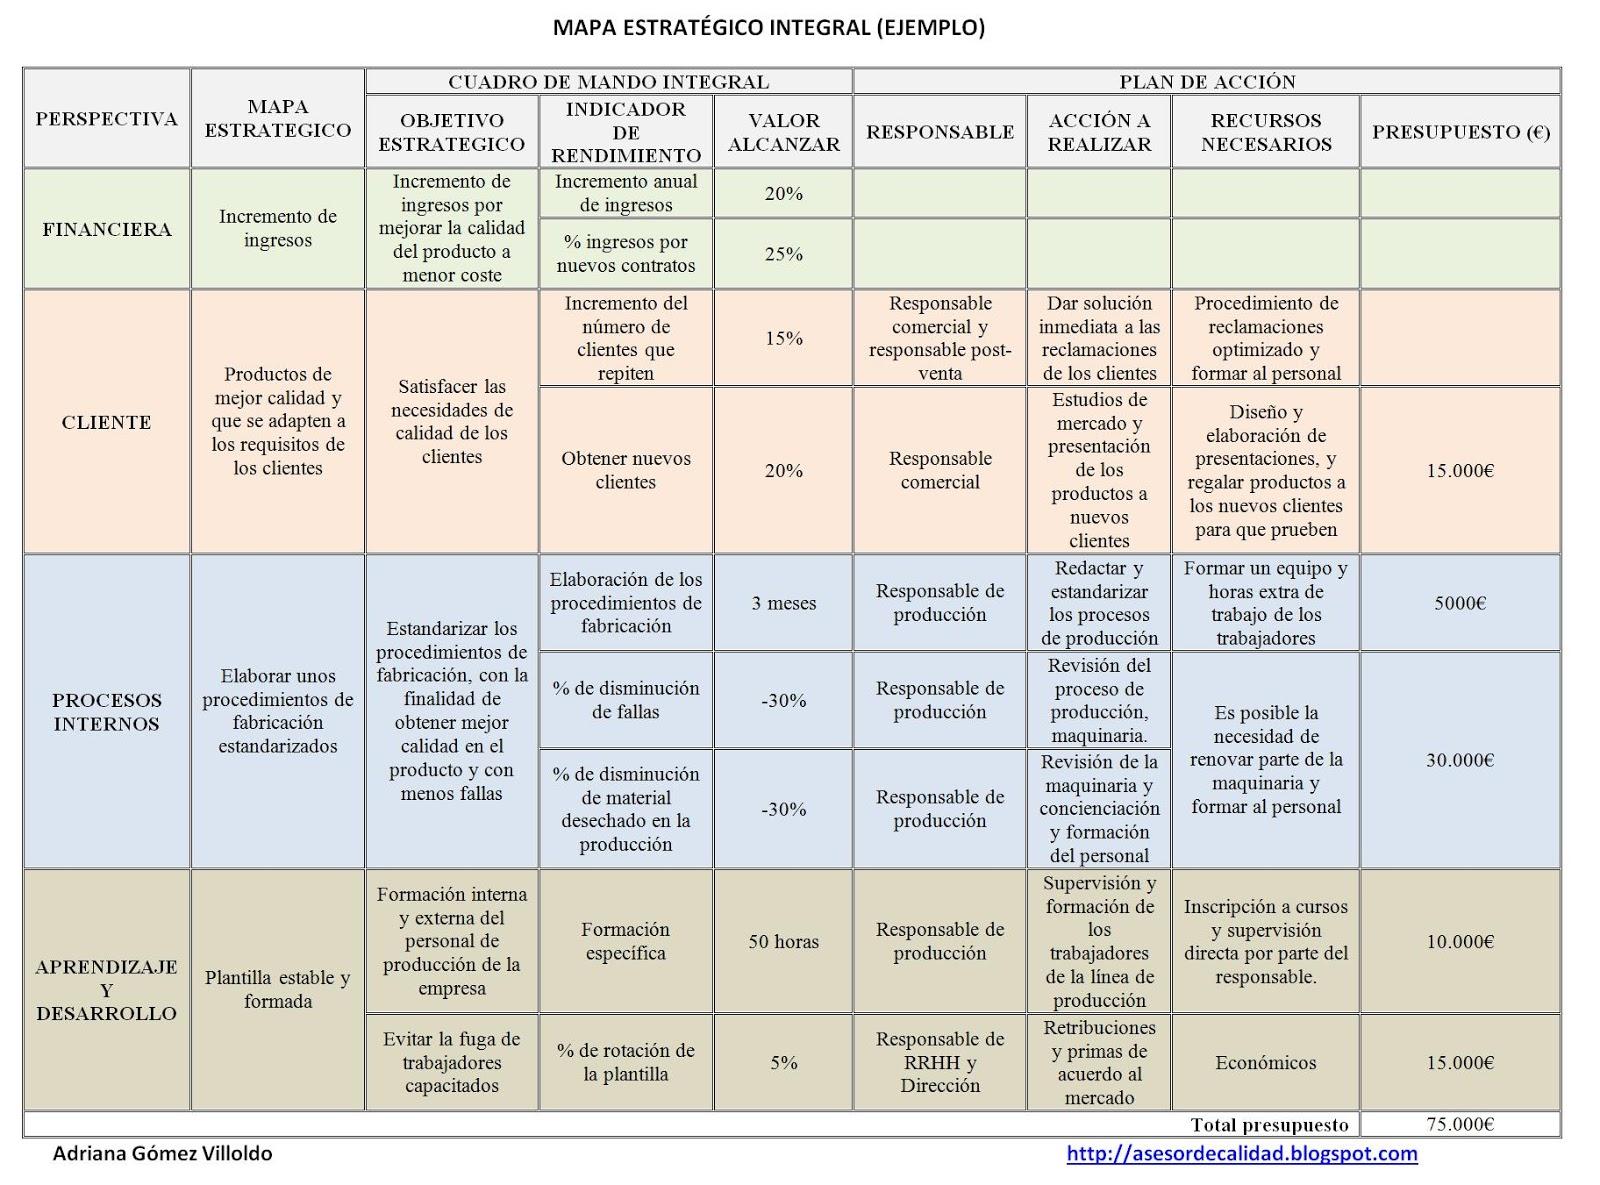 Cuadro de mando integral (CMI): herramienta estratégica ...